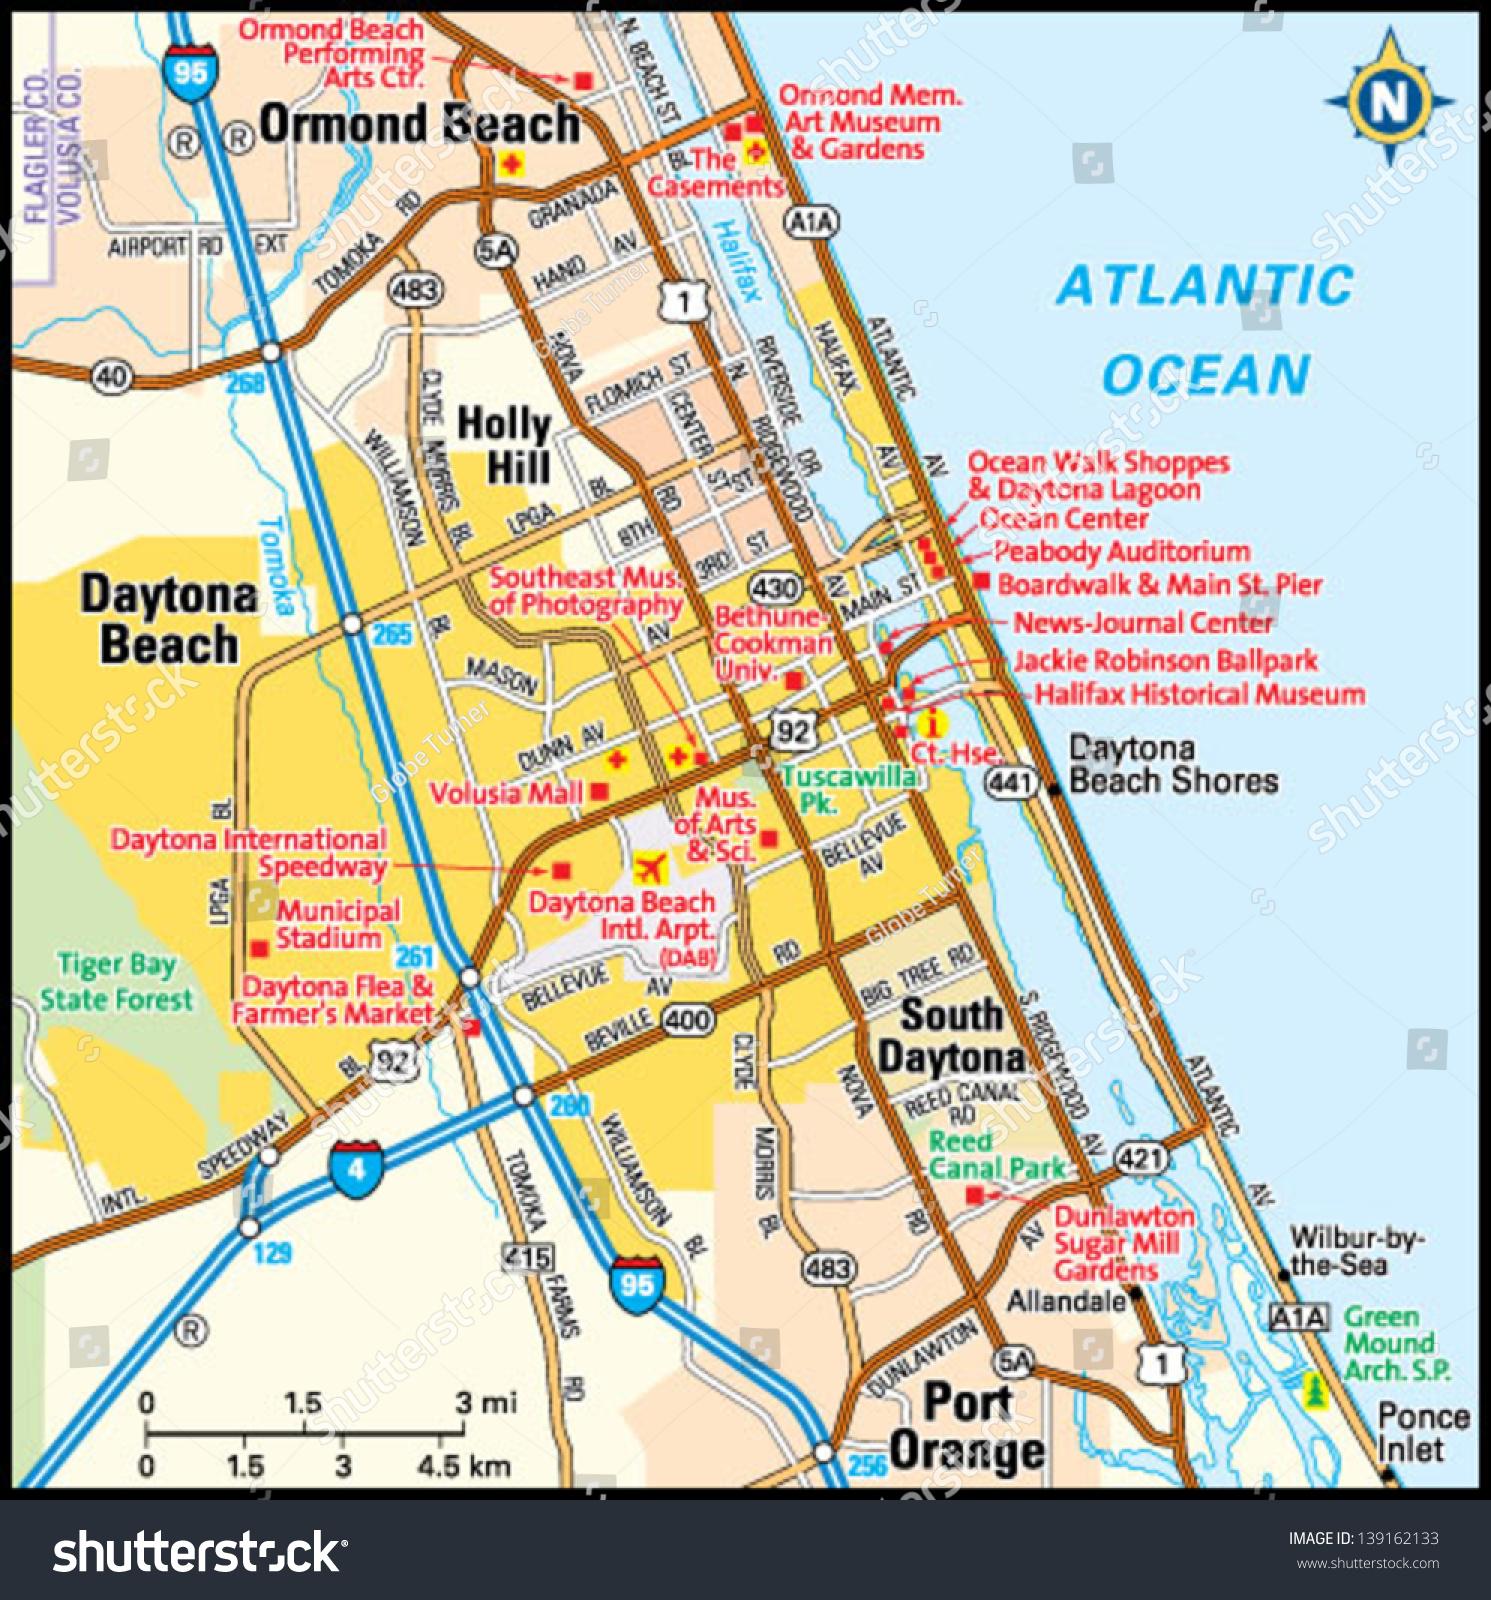 Daytona Beach Florida Area Map Stock Vector (Royalty Free) 139162133 - Map Of Daytona Beach Florida